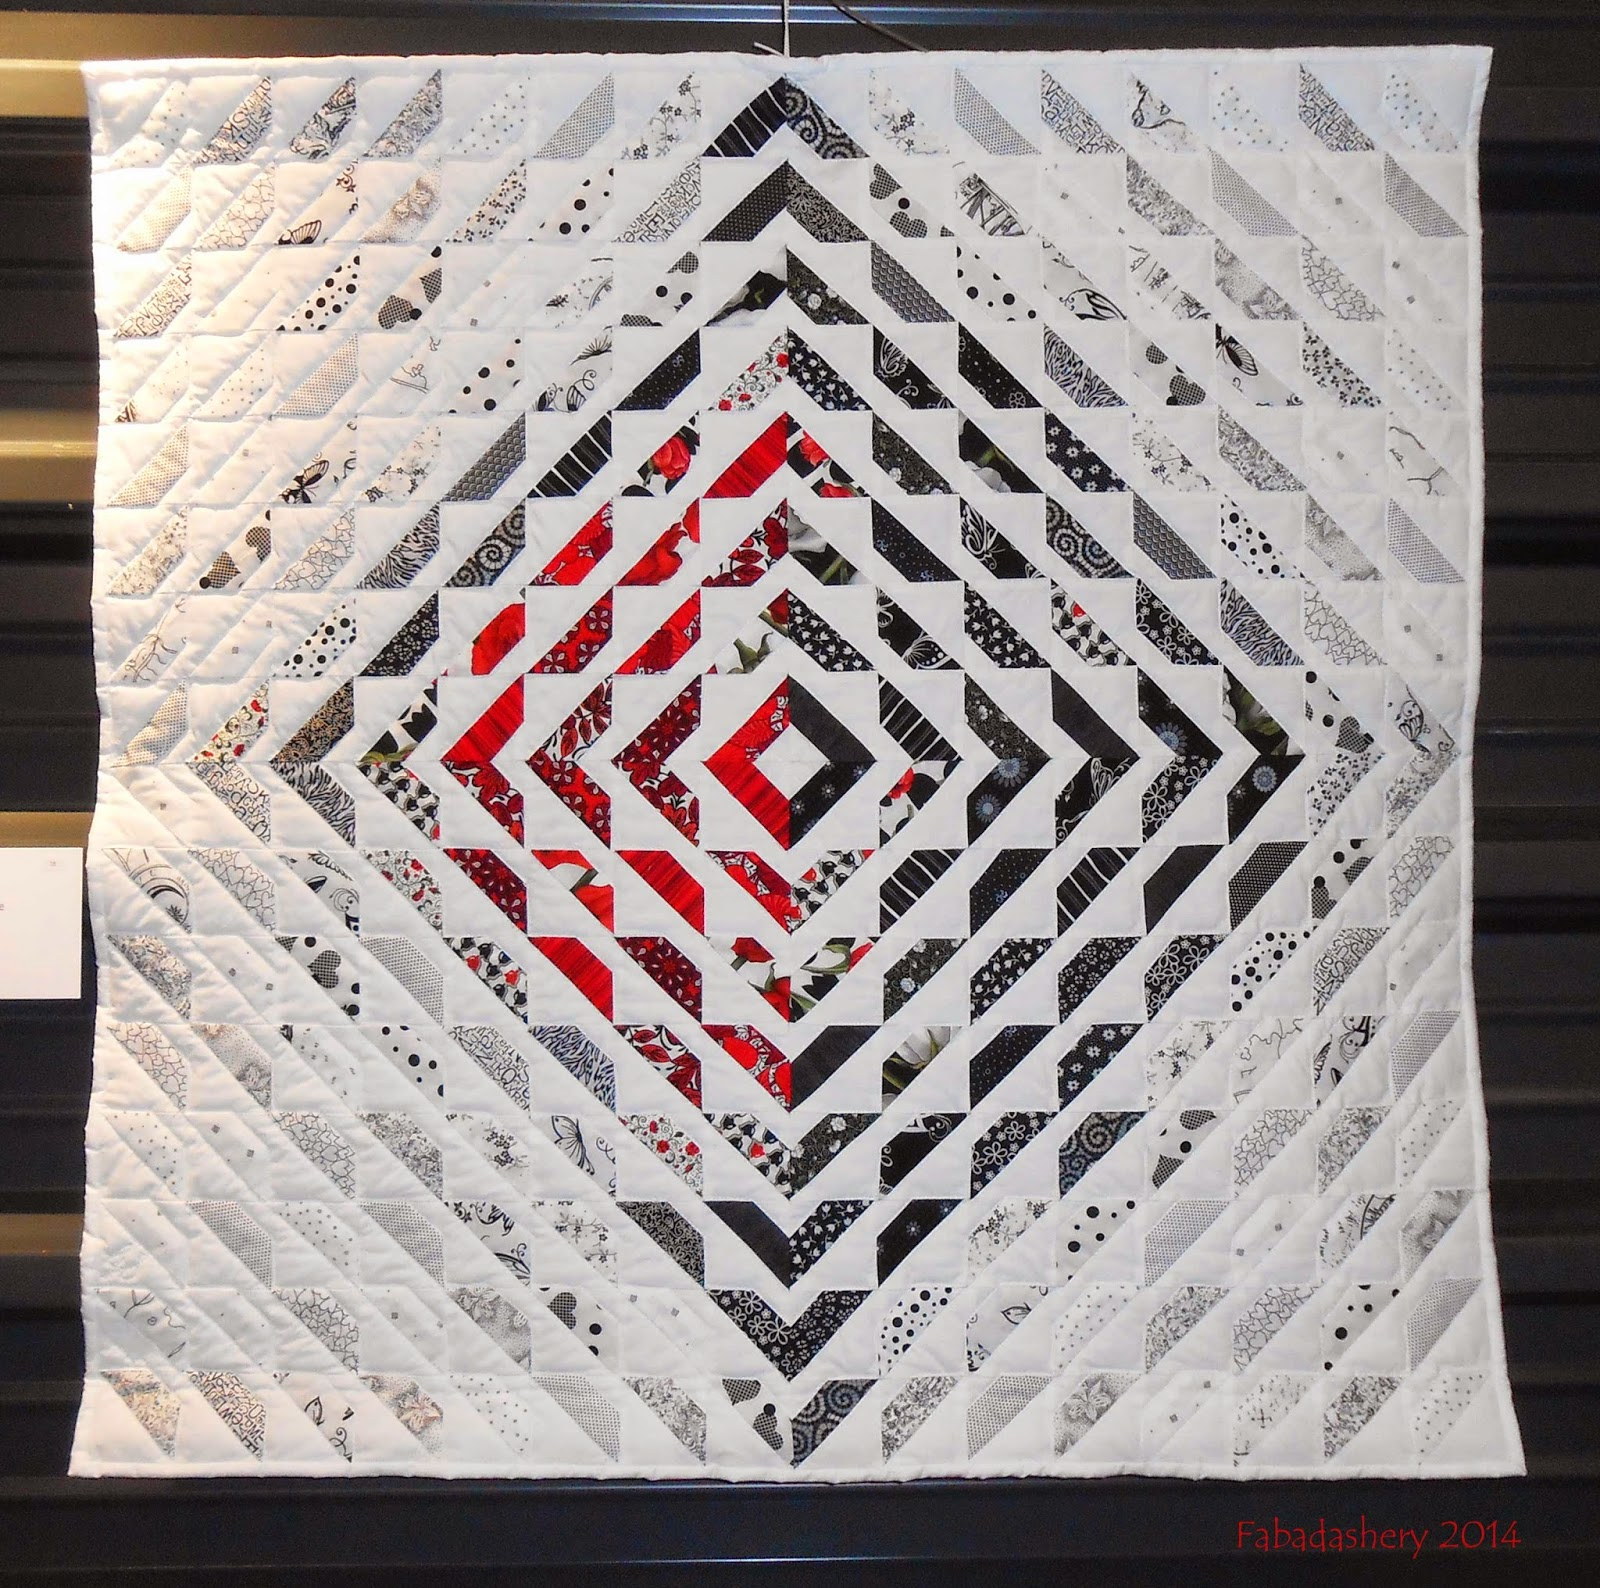 Quilt 'Blanc Noir Rouge' by Gaby Stebler 2014